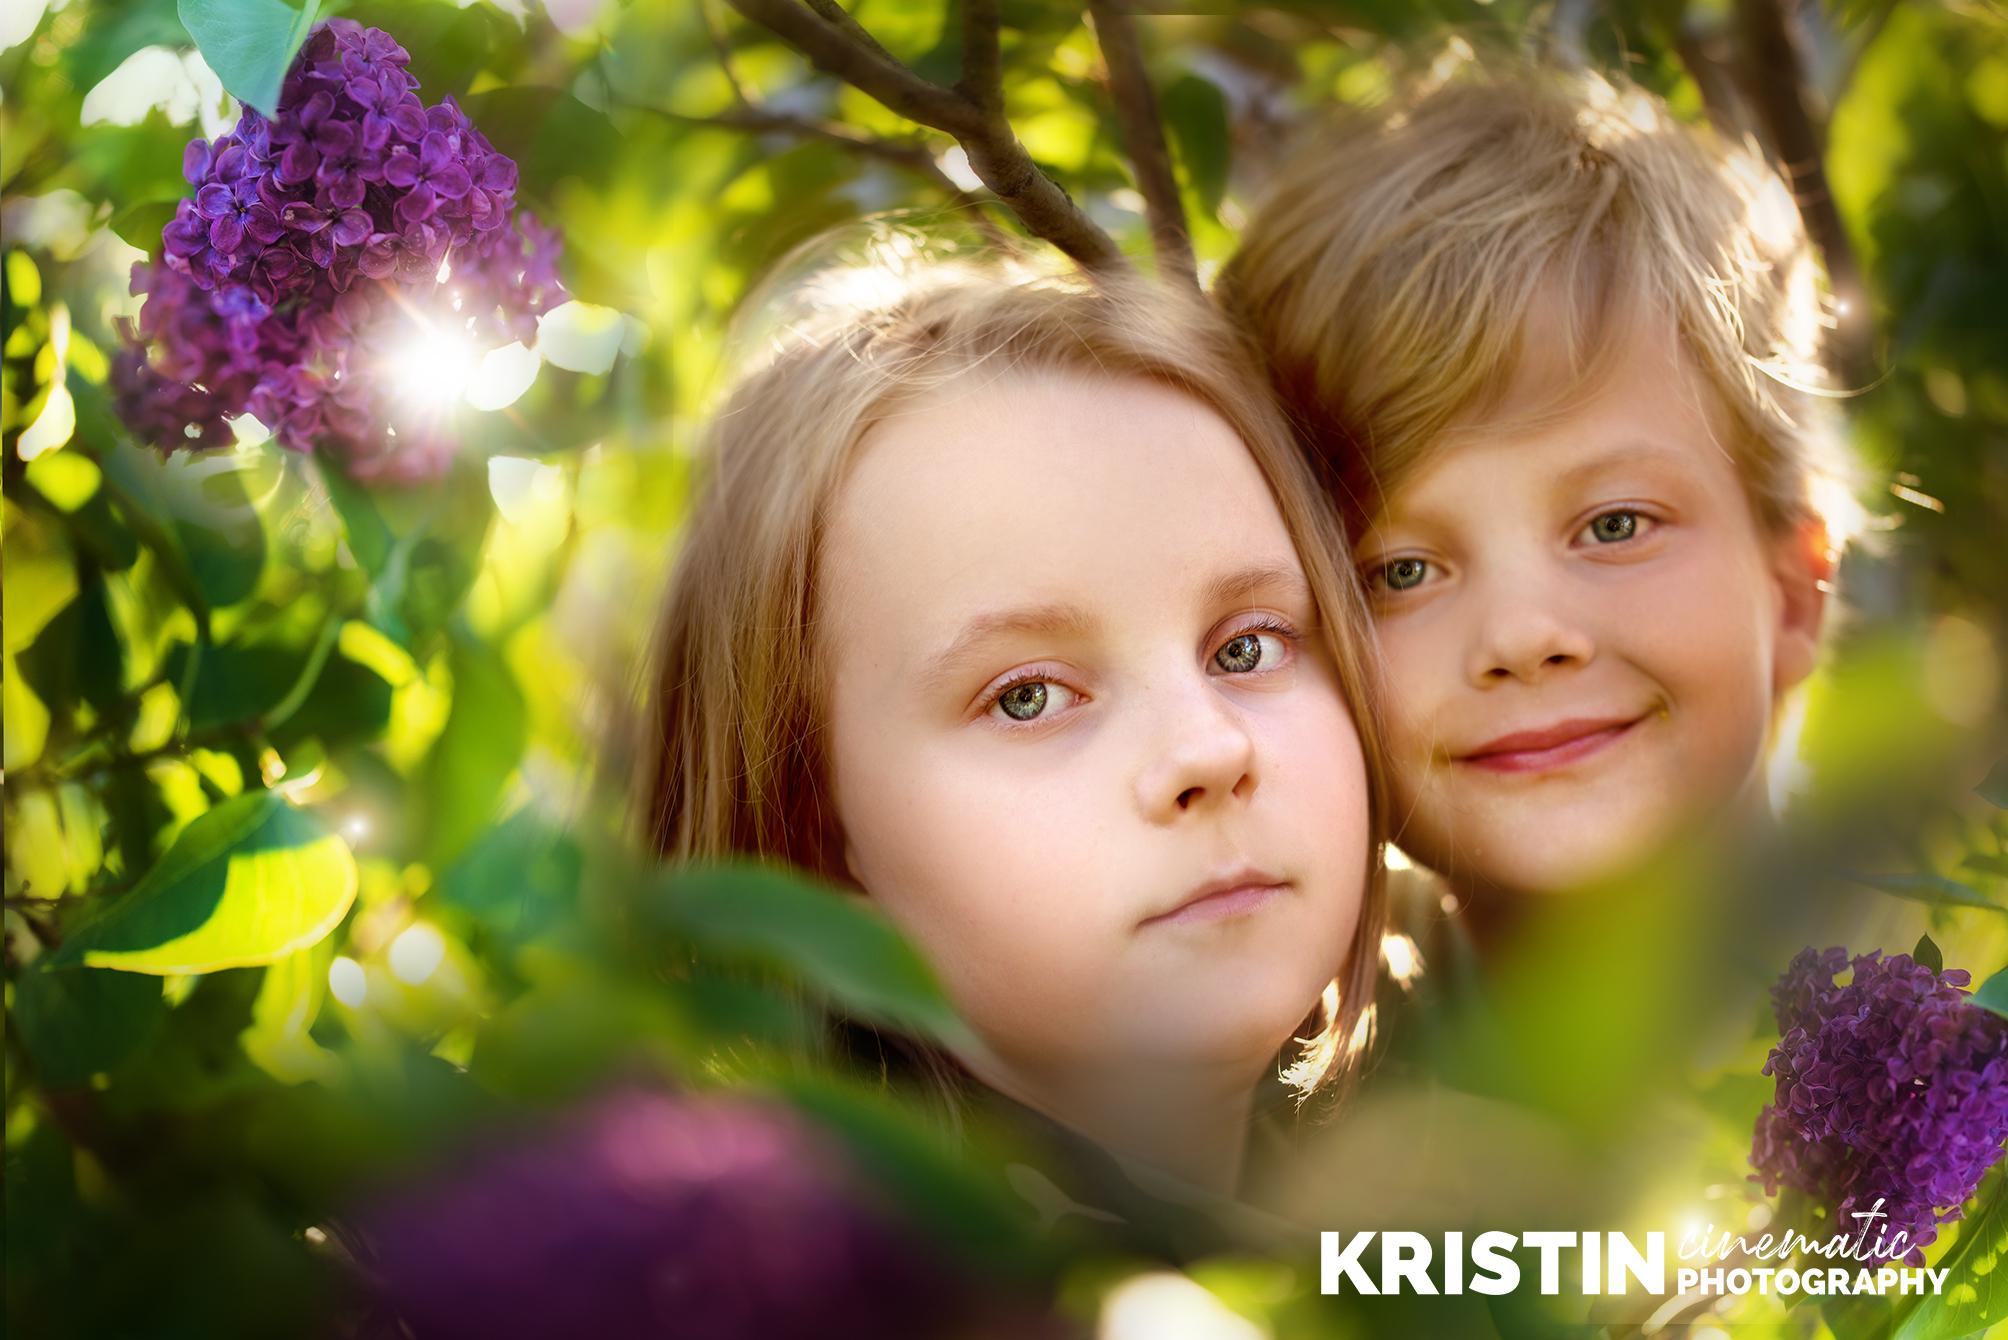 Fotograf i Eskilstuna Kristin - Photography-9Acop.jpg